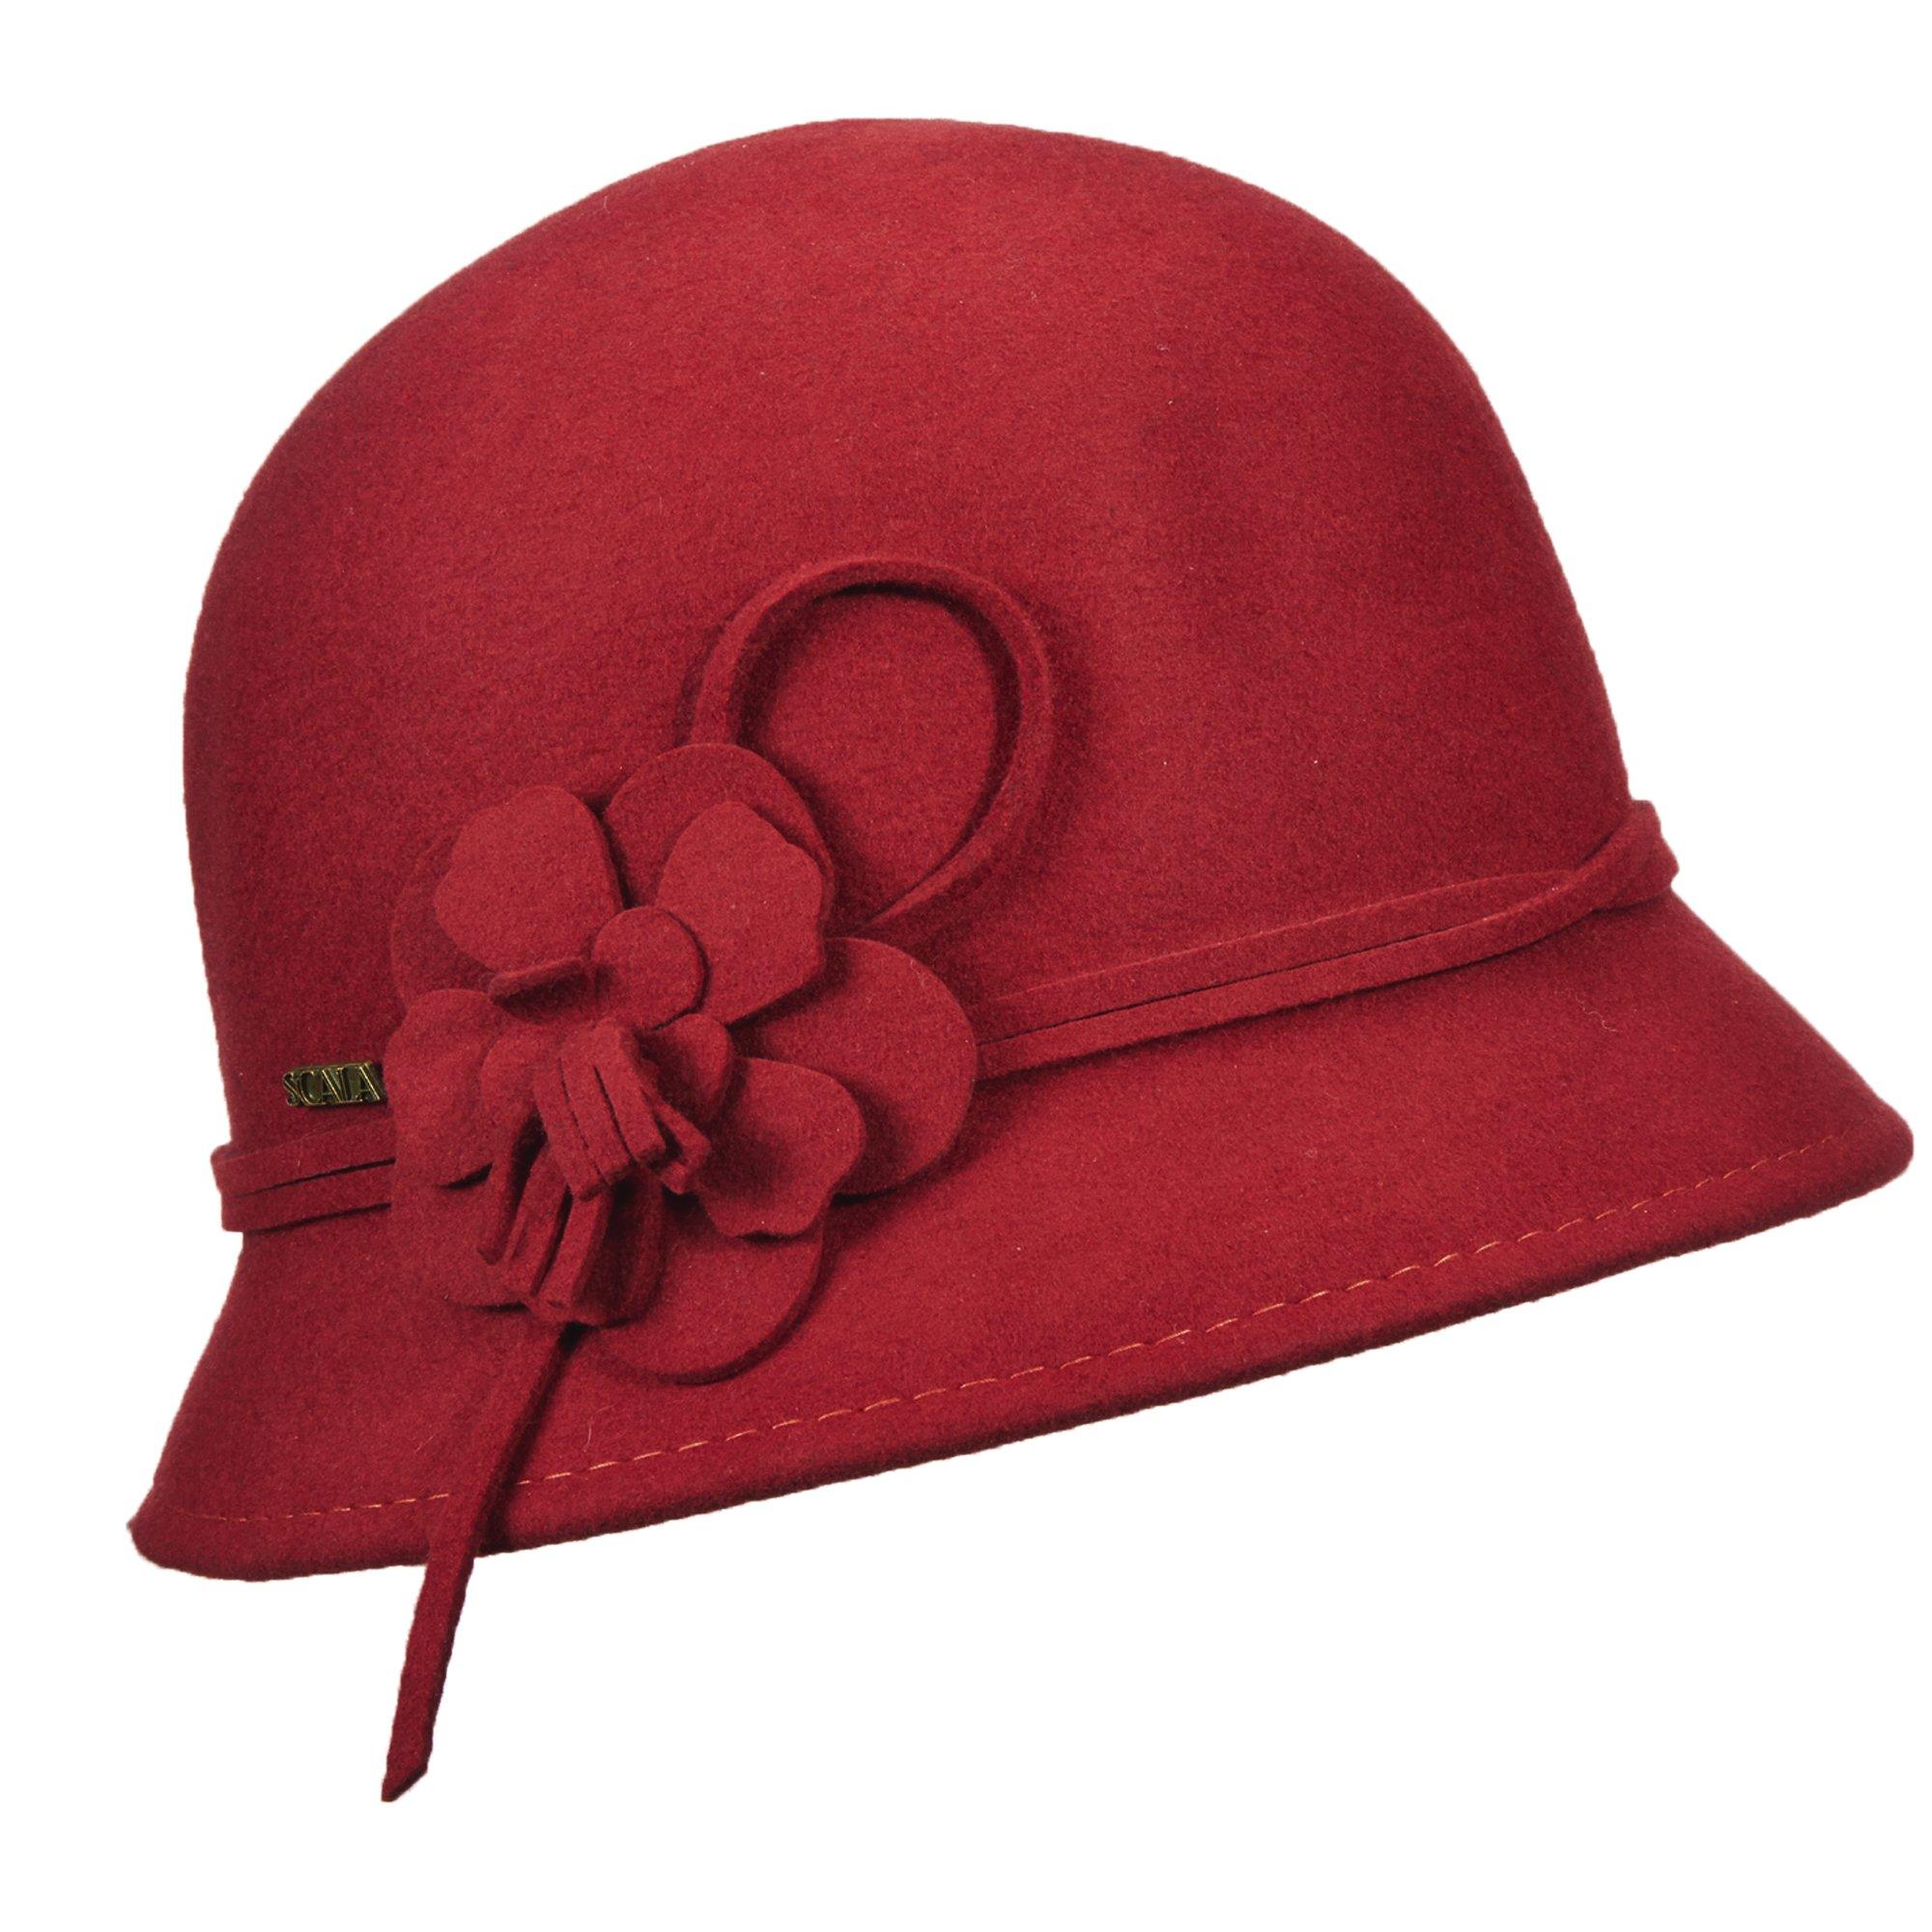 SCALA Wool Felt Cloche with Flowers HAT (Cinnamon)